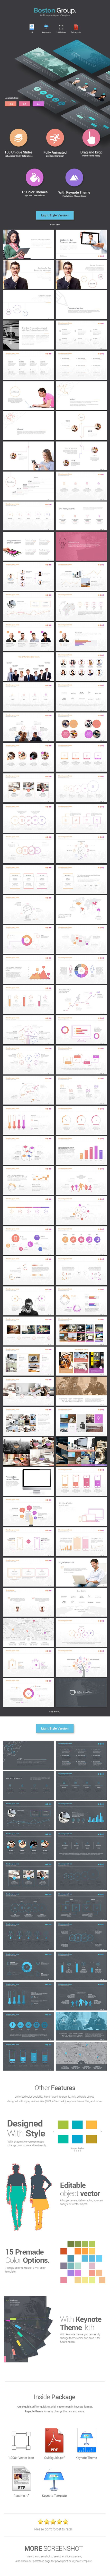 Boston - Creative Keynote Template #design #slides Download: http://graphicriver.net/item/boston-creative-keynote-template/13370727?ref=ksioks